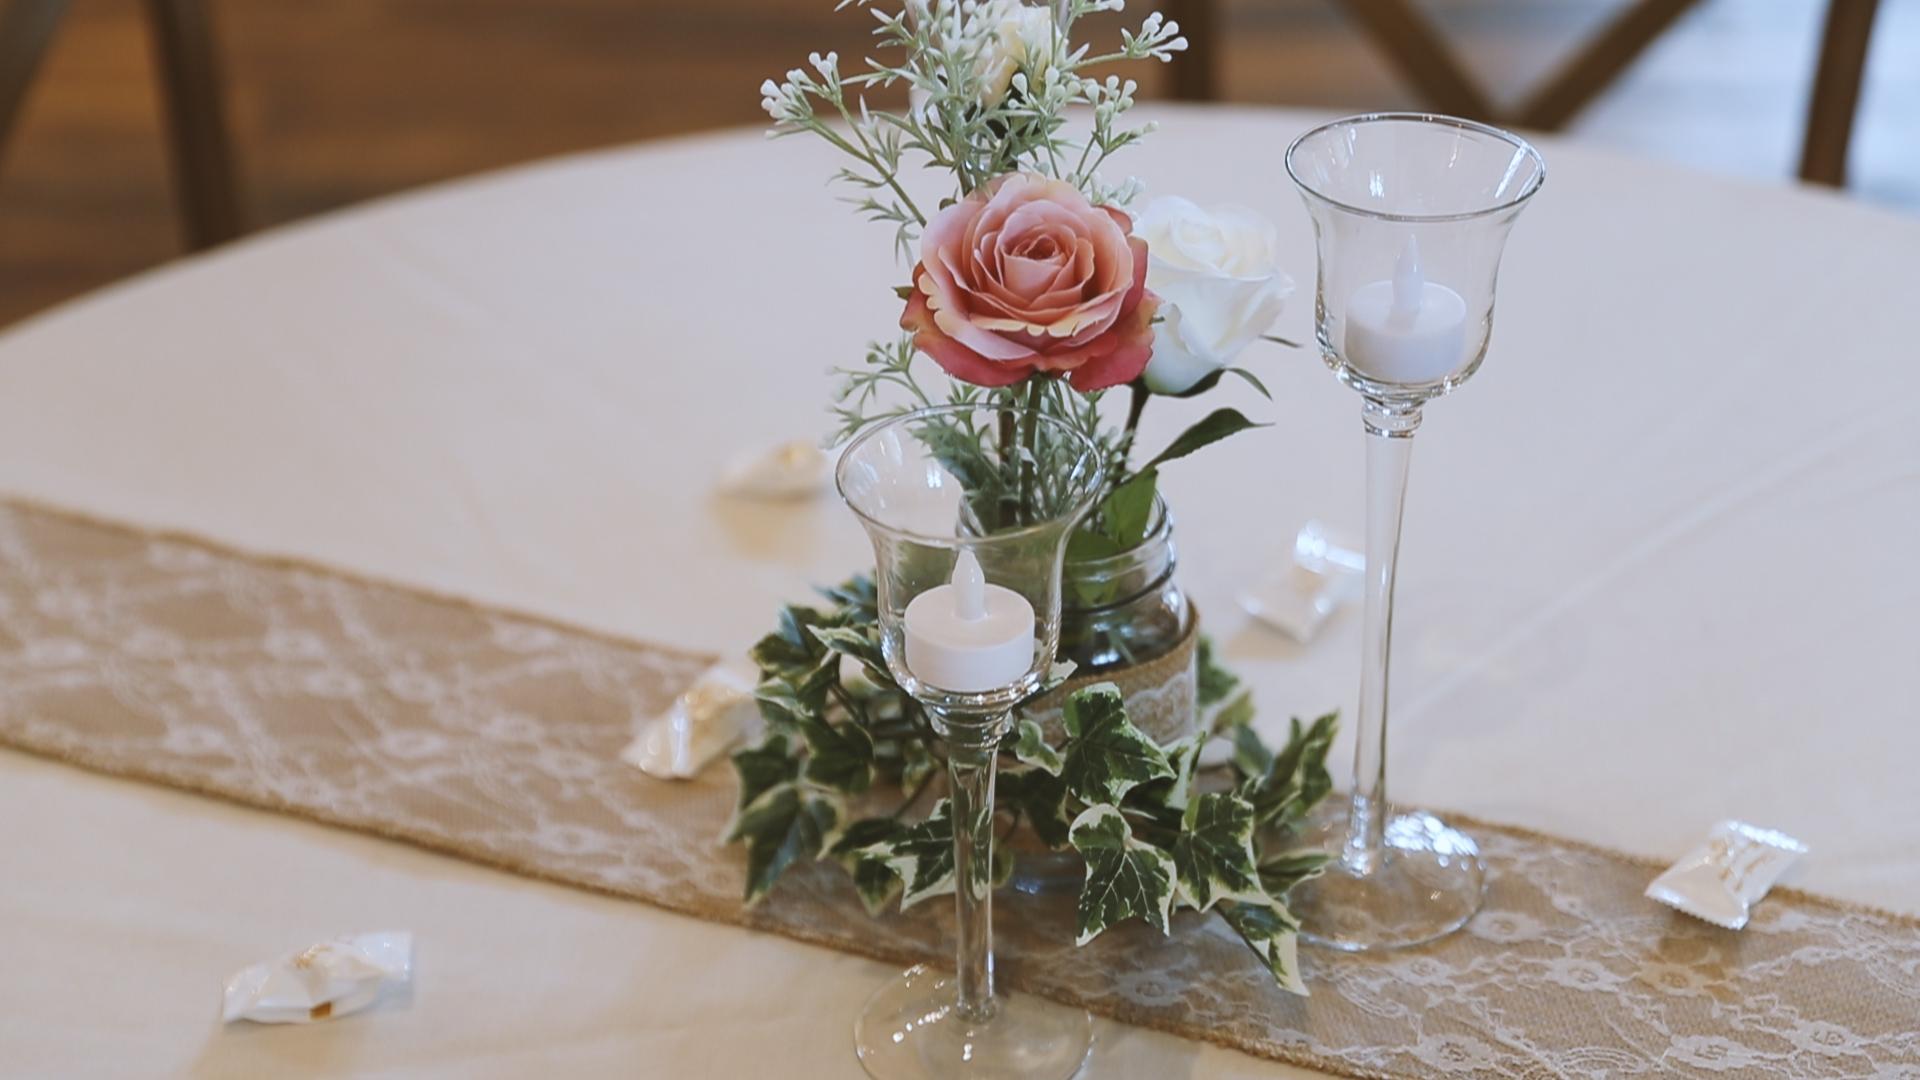 Amanda and Hayden_The White Magnolia Farm Weddings_New Orleans videographer_wedding centerpiece idea